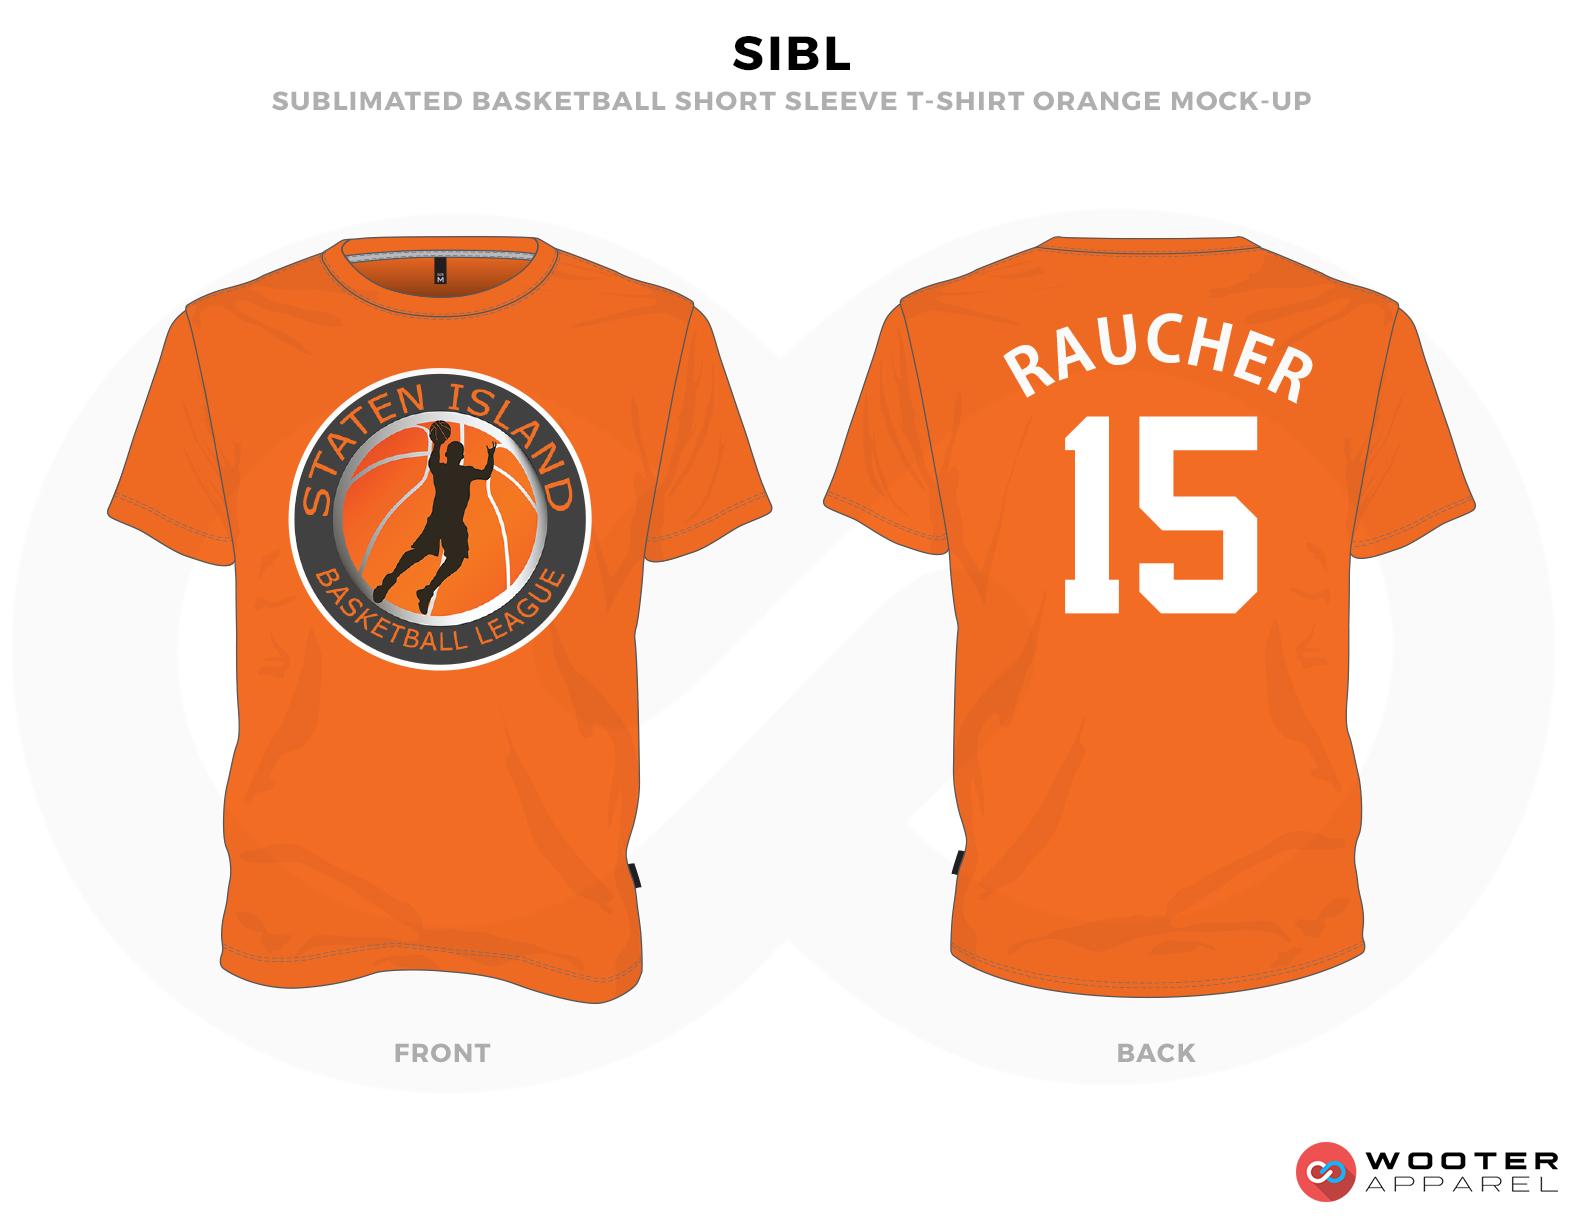 SIBL Orange Black and White RICHMOND ELITE ABA Grey Red and White Premium Shooting Shirt